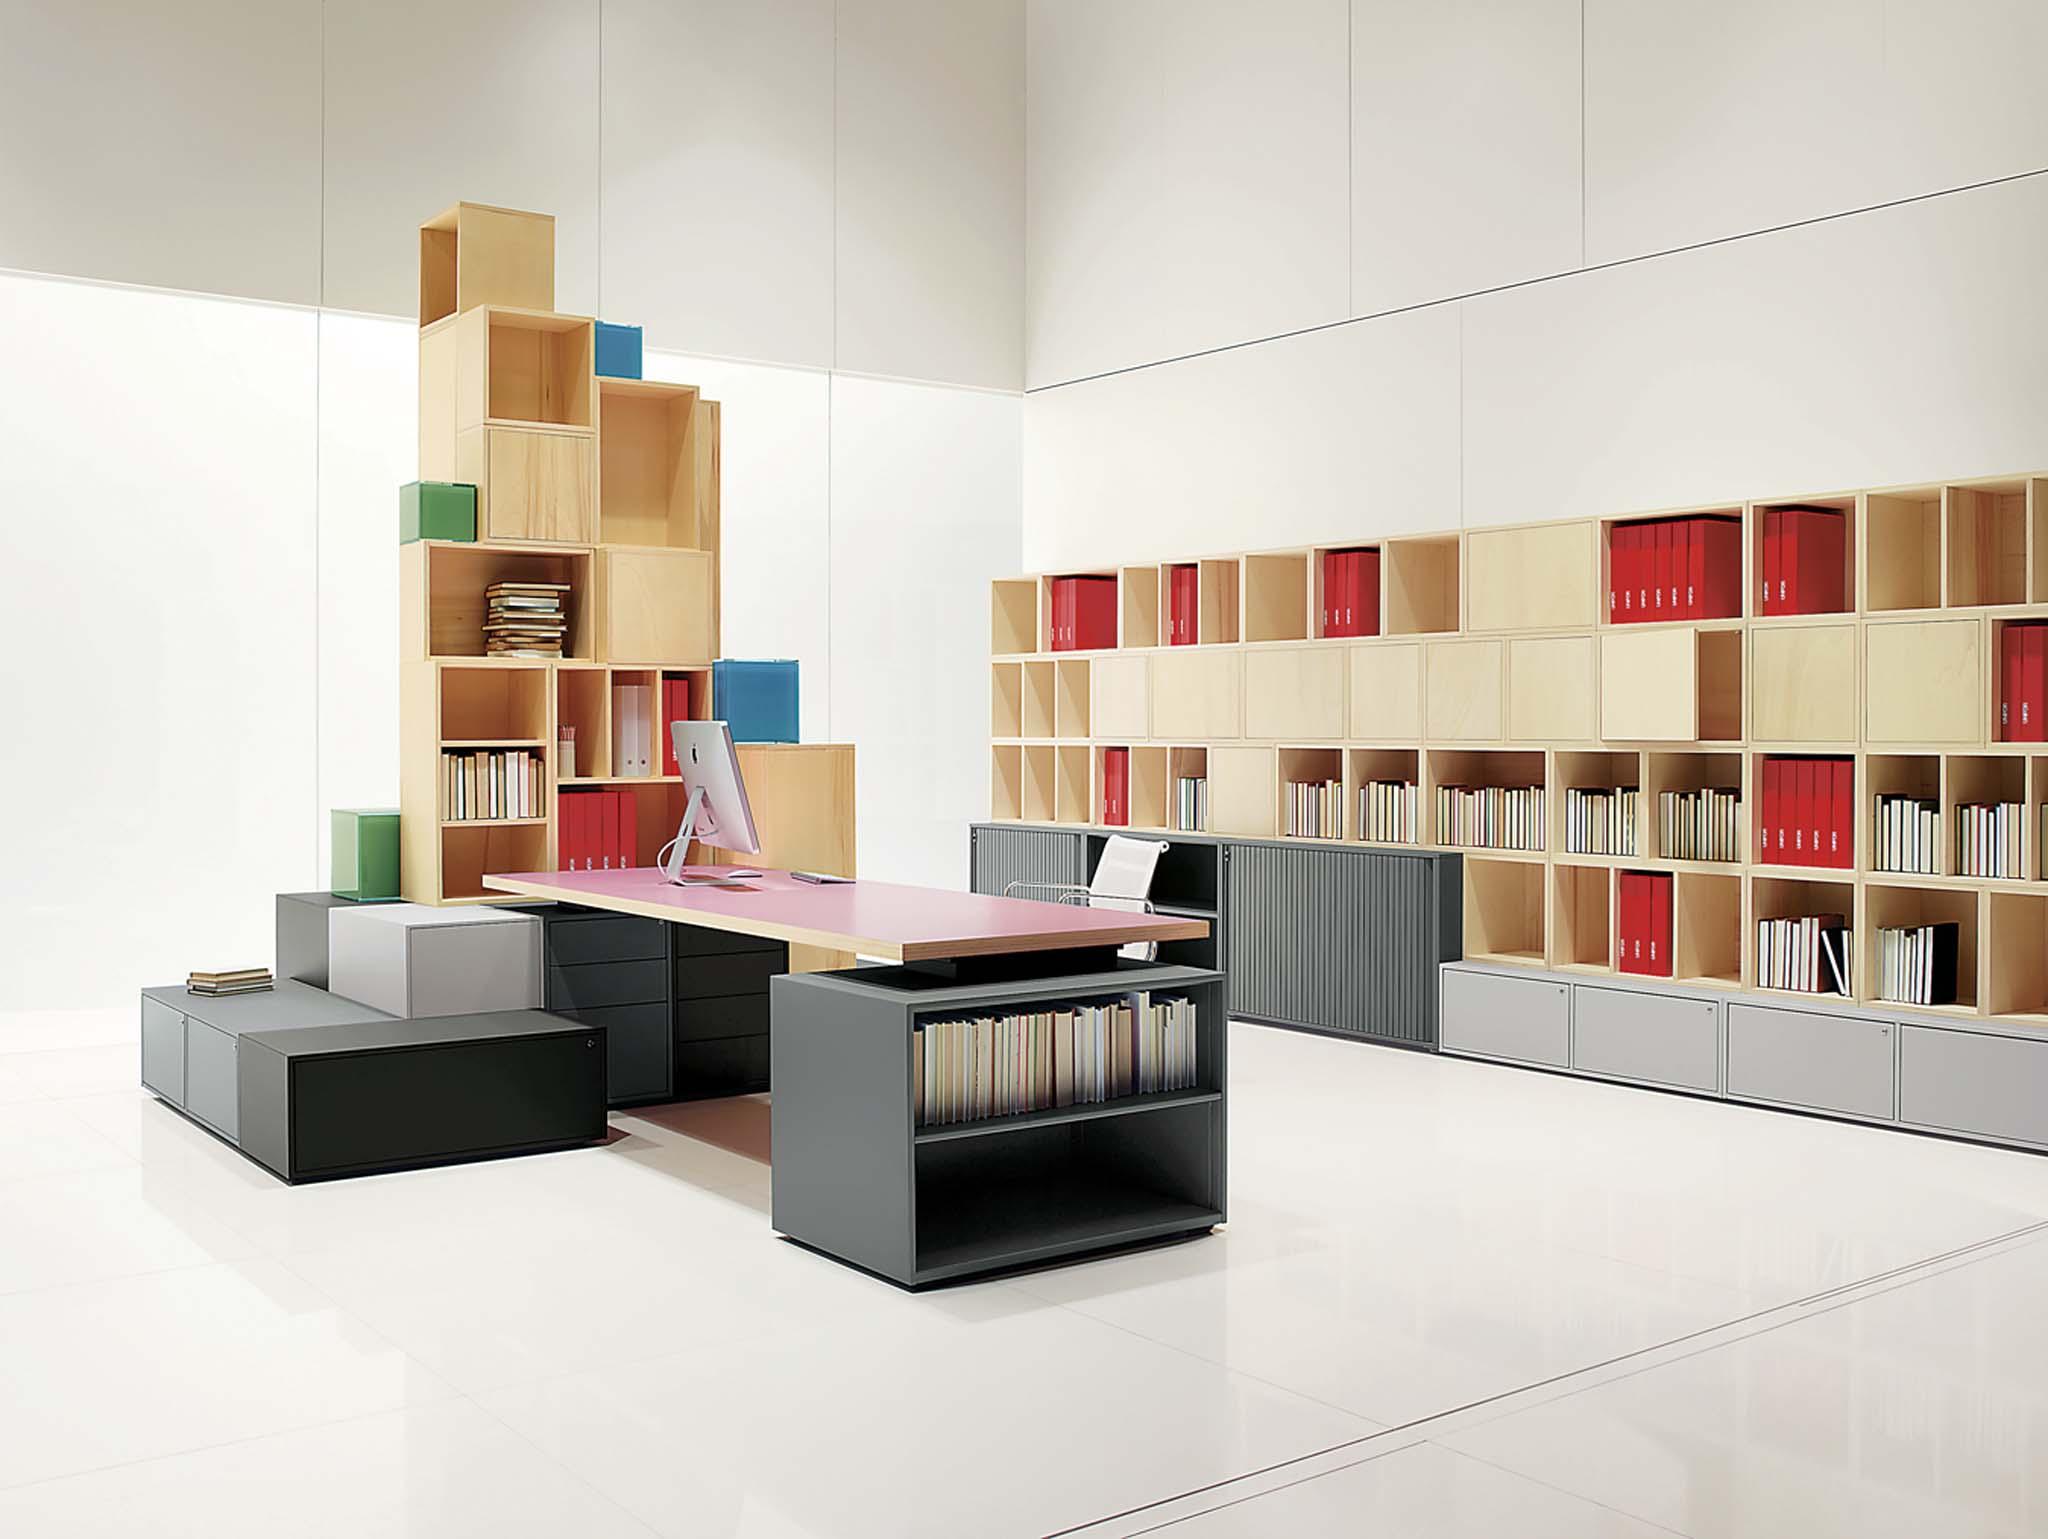 mobilier modulaire cases unifor. Black Bedroom Furniture Sets. Home Design Ideas